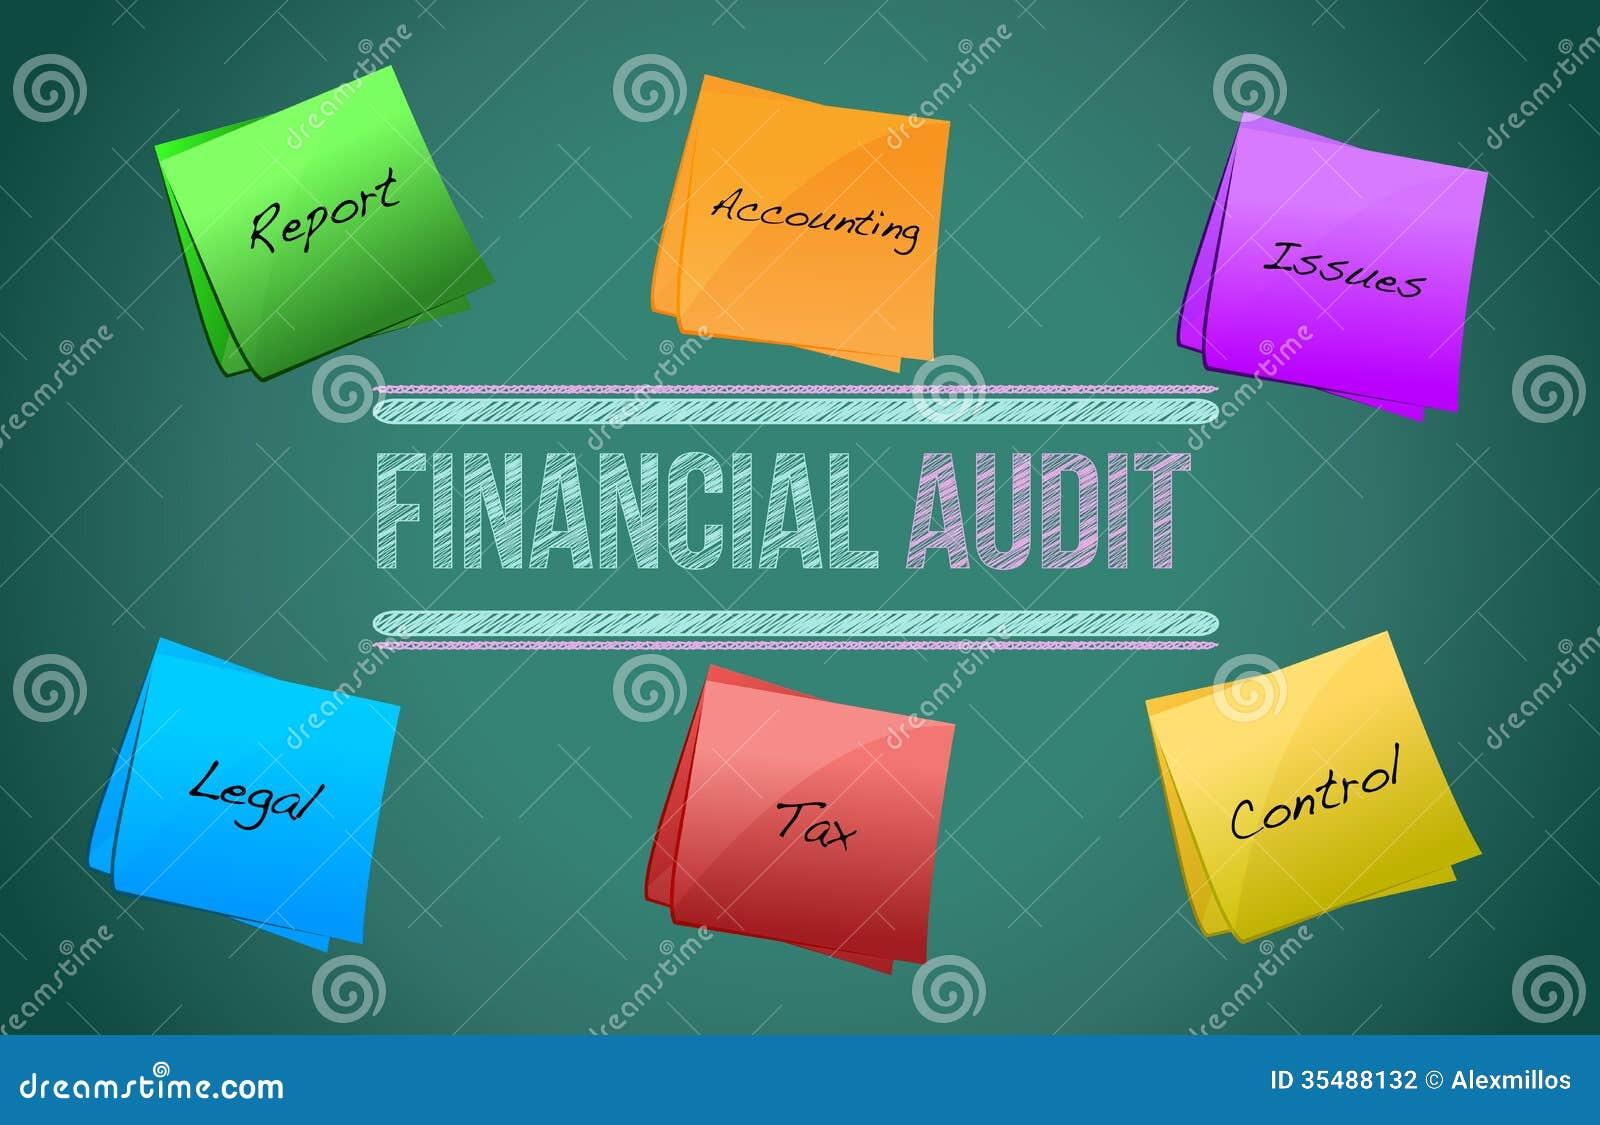 Financial Audit Diagram Illustration Design Stock Photography ...